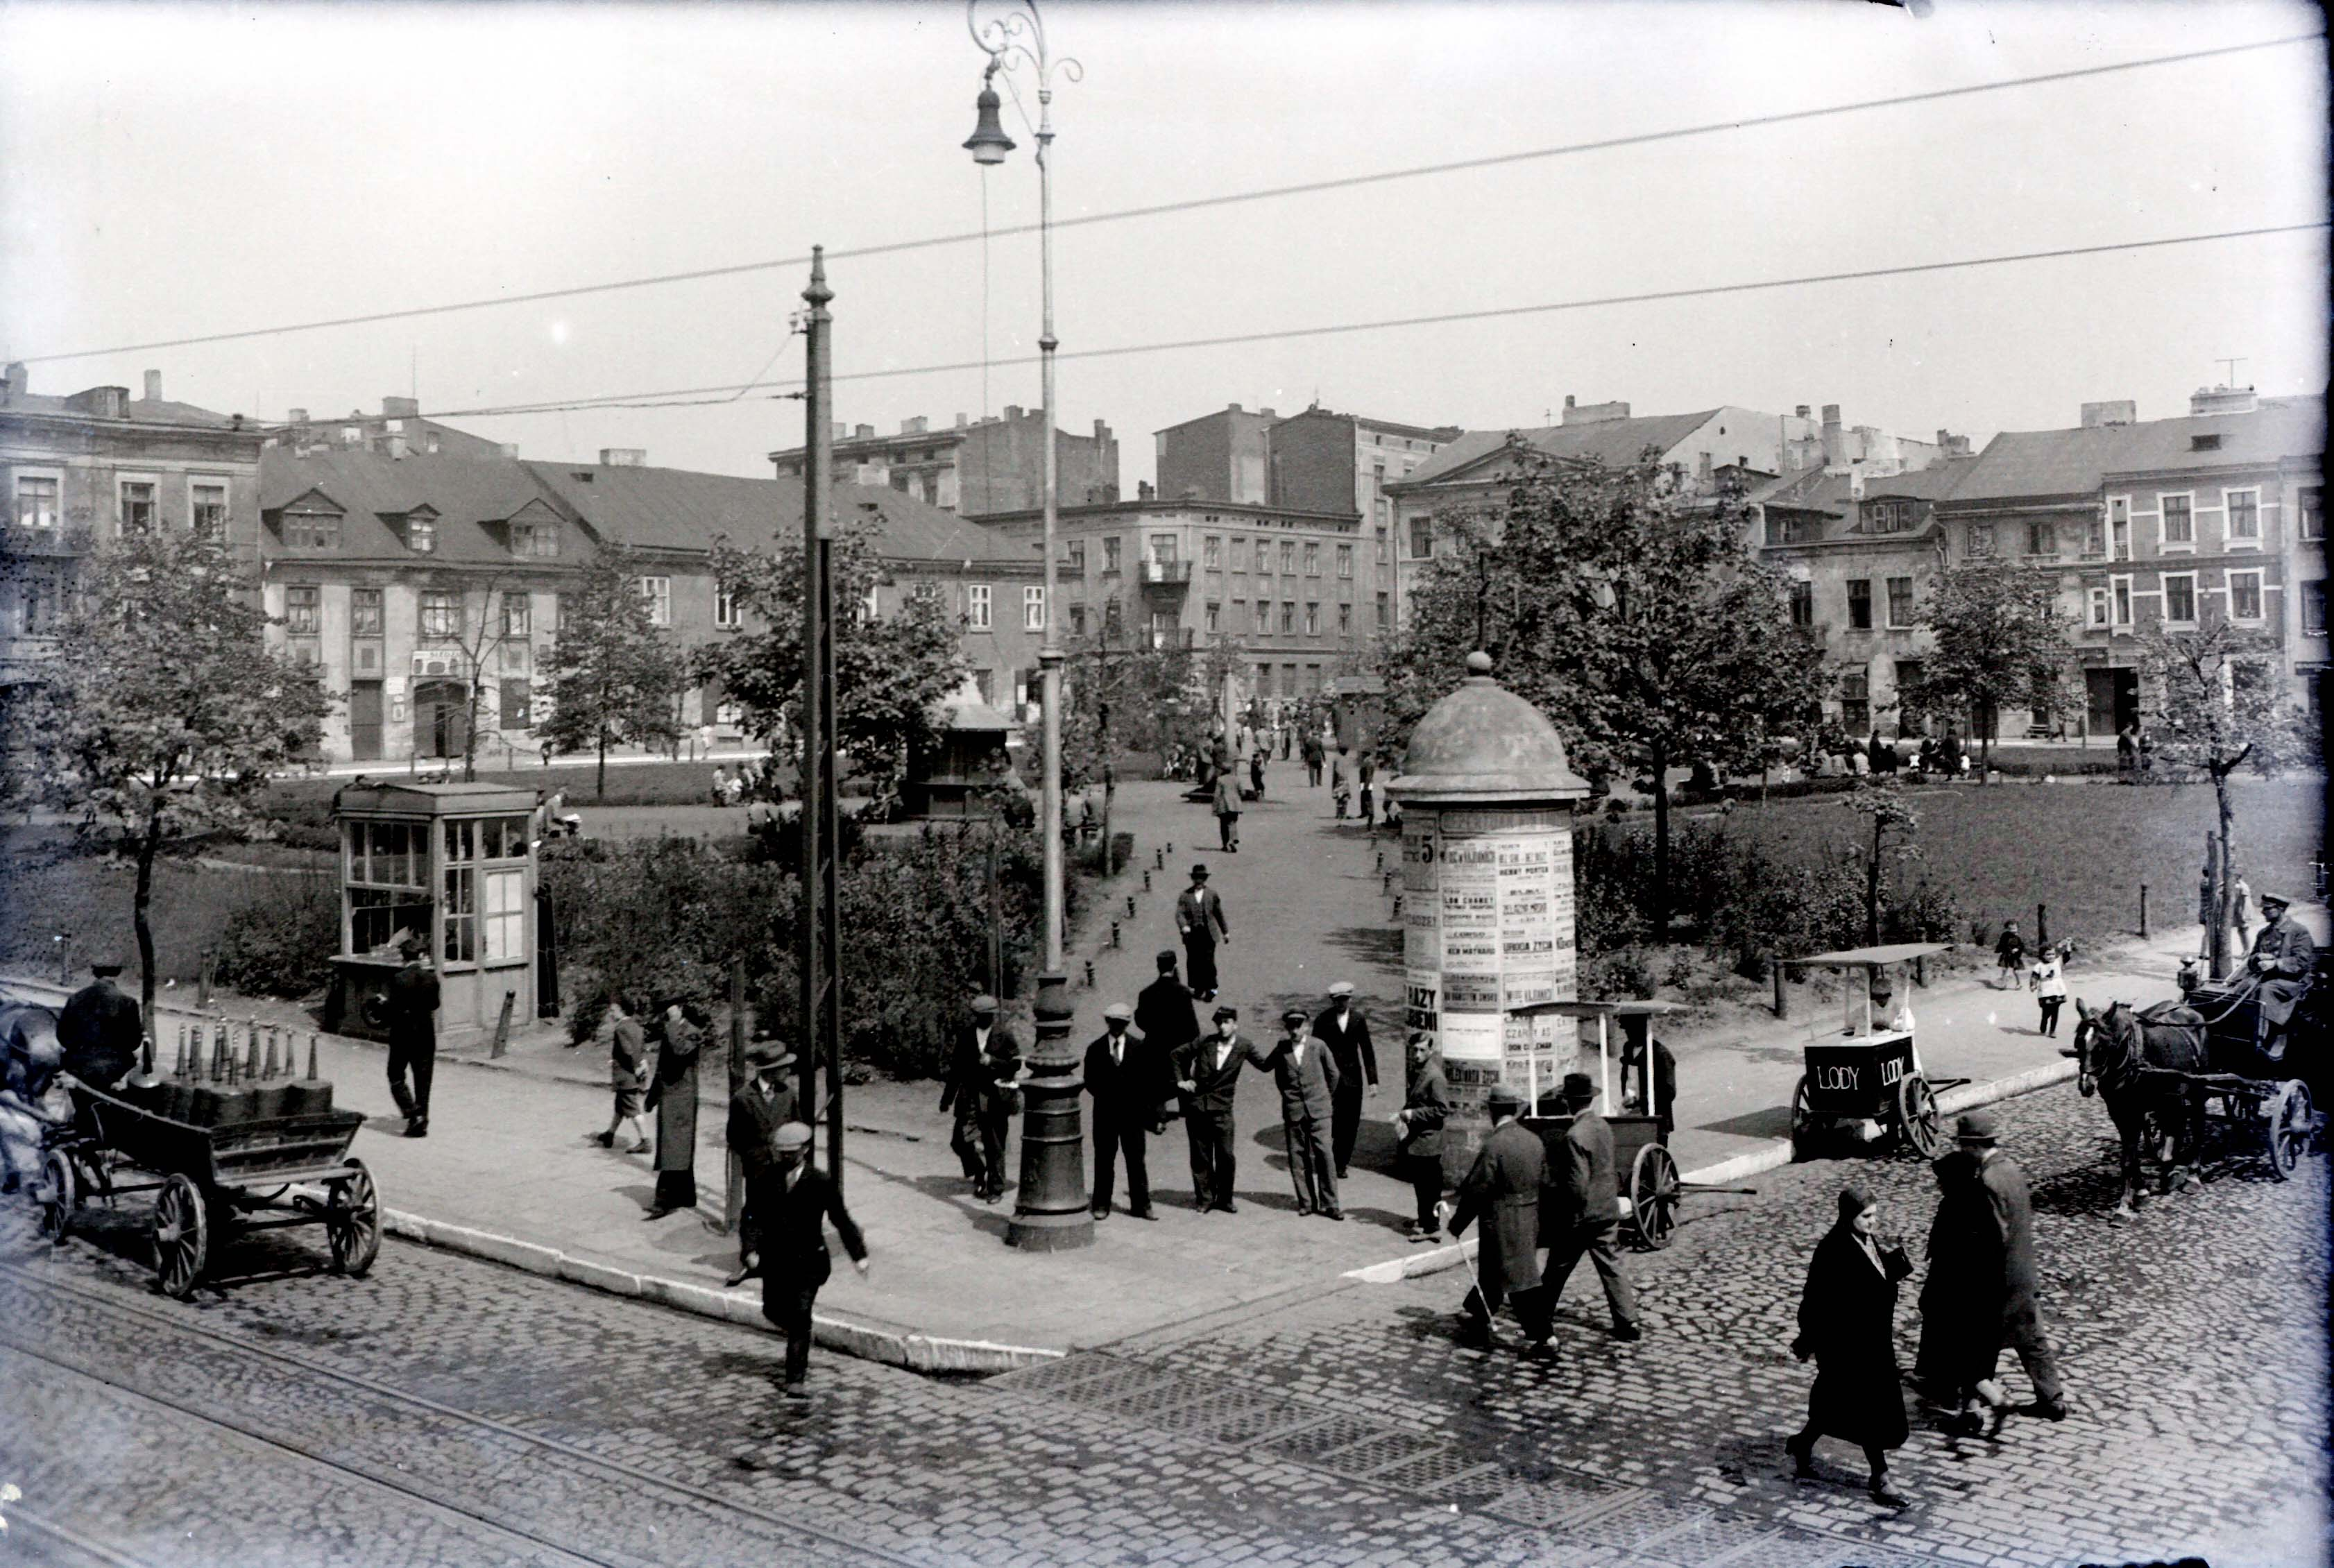 Łódź: The Old Town Market